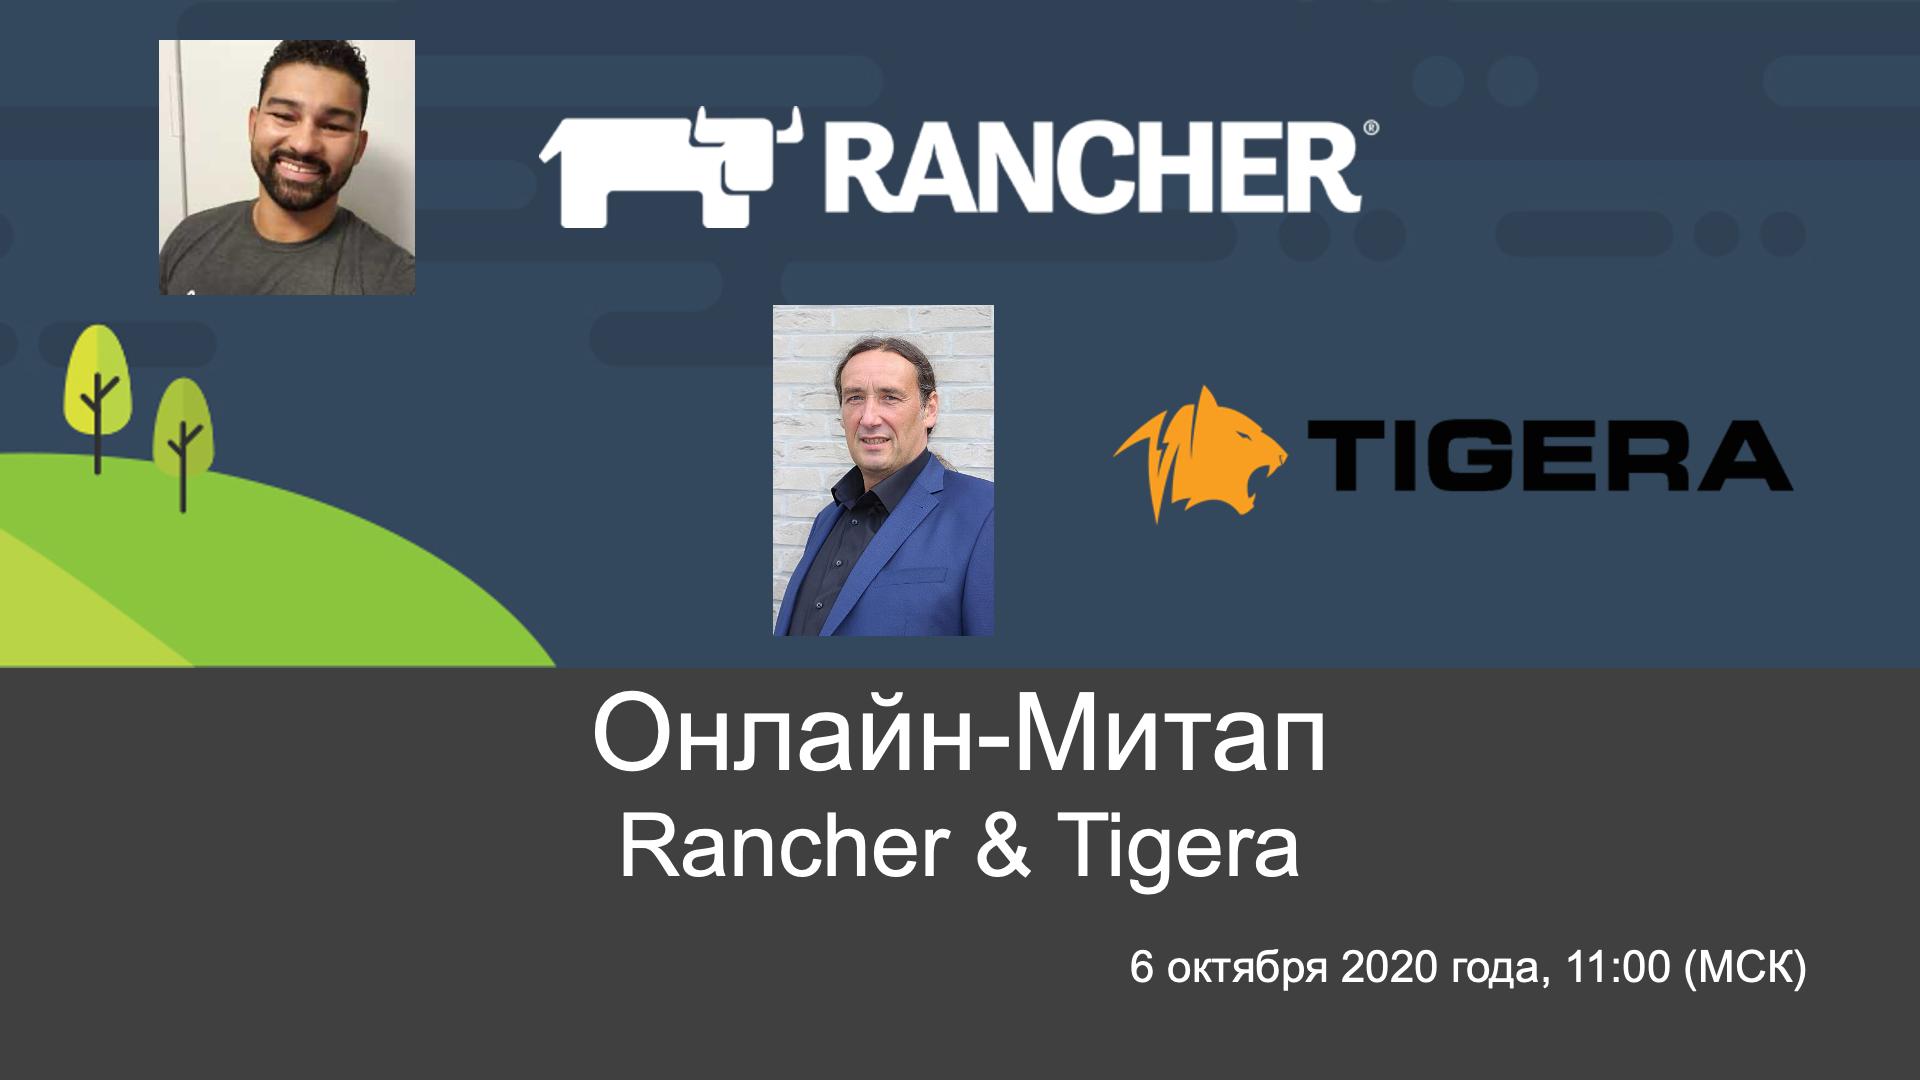 Rancher and Tigera online meetup